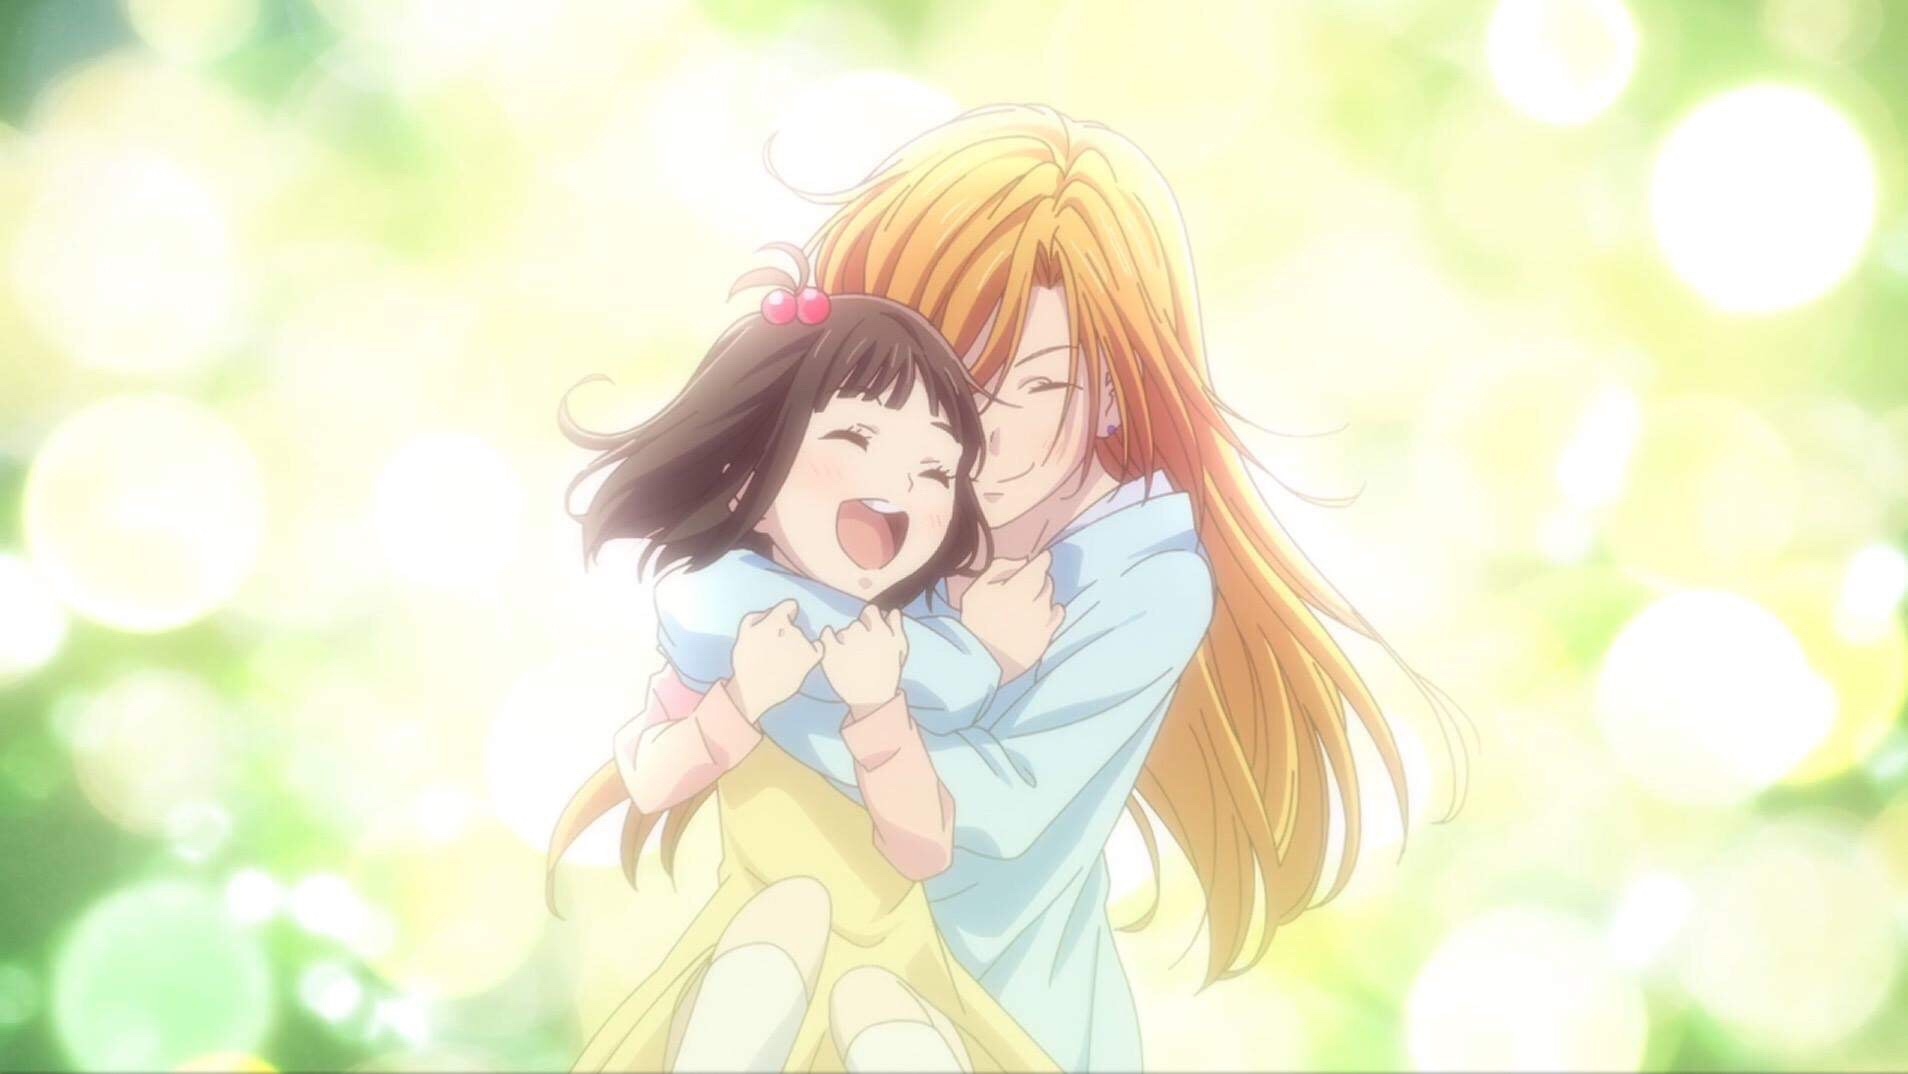 Toruh Honda being hugged by her mother, Kyoko Honda